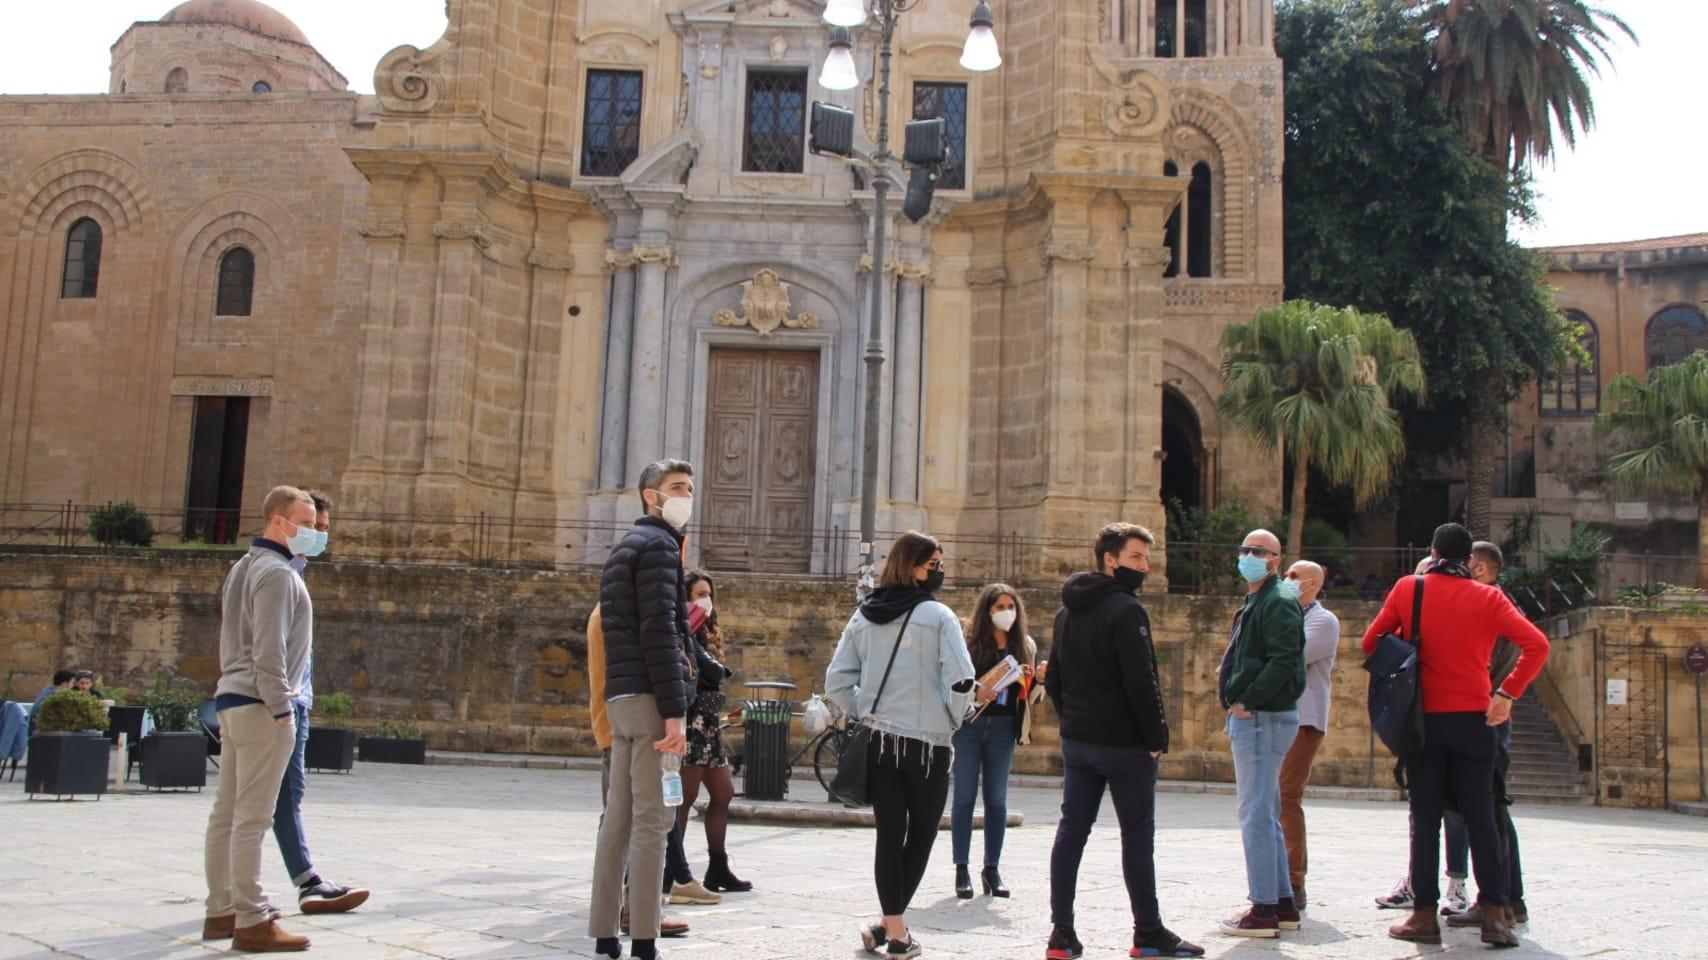 CityWalk - Historic Palermo 2